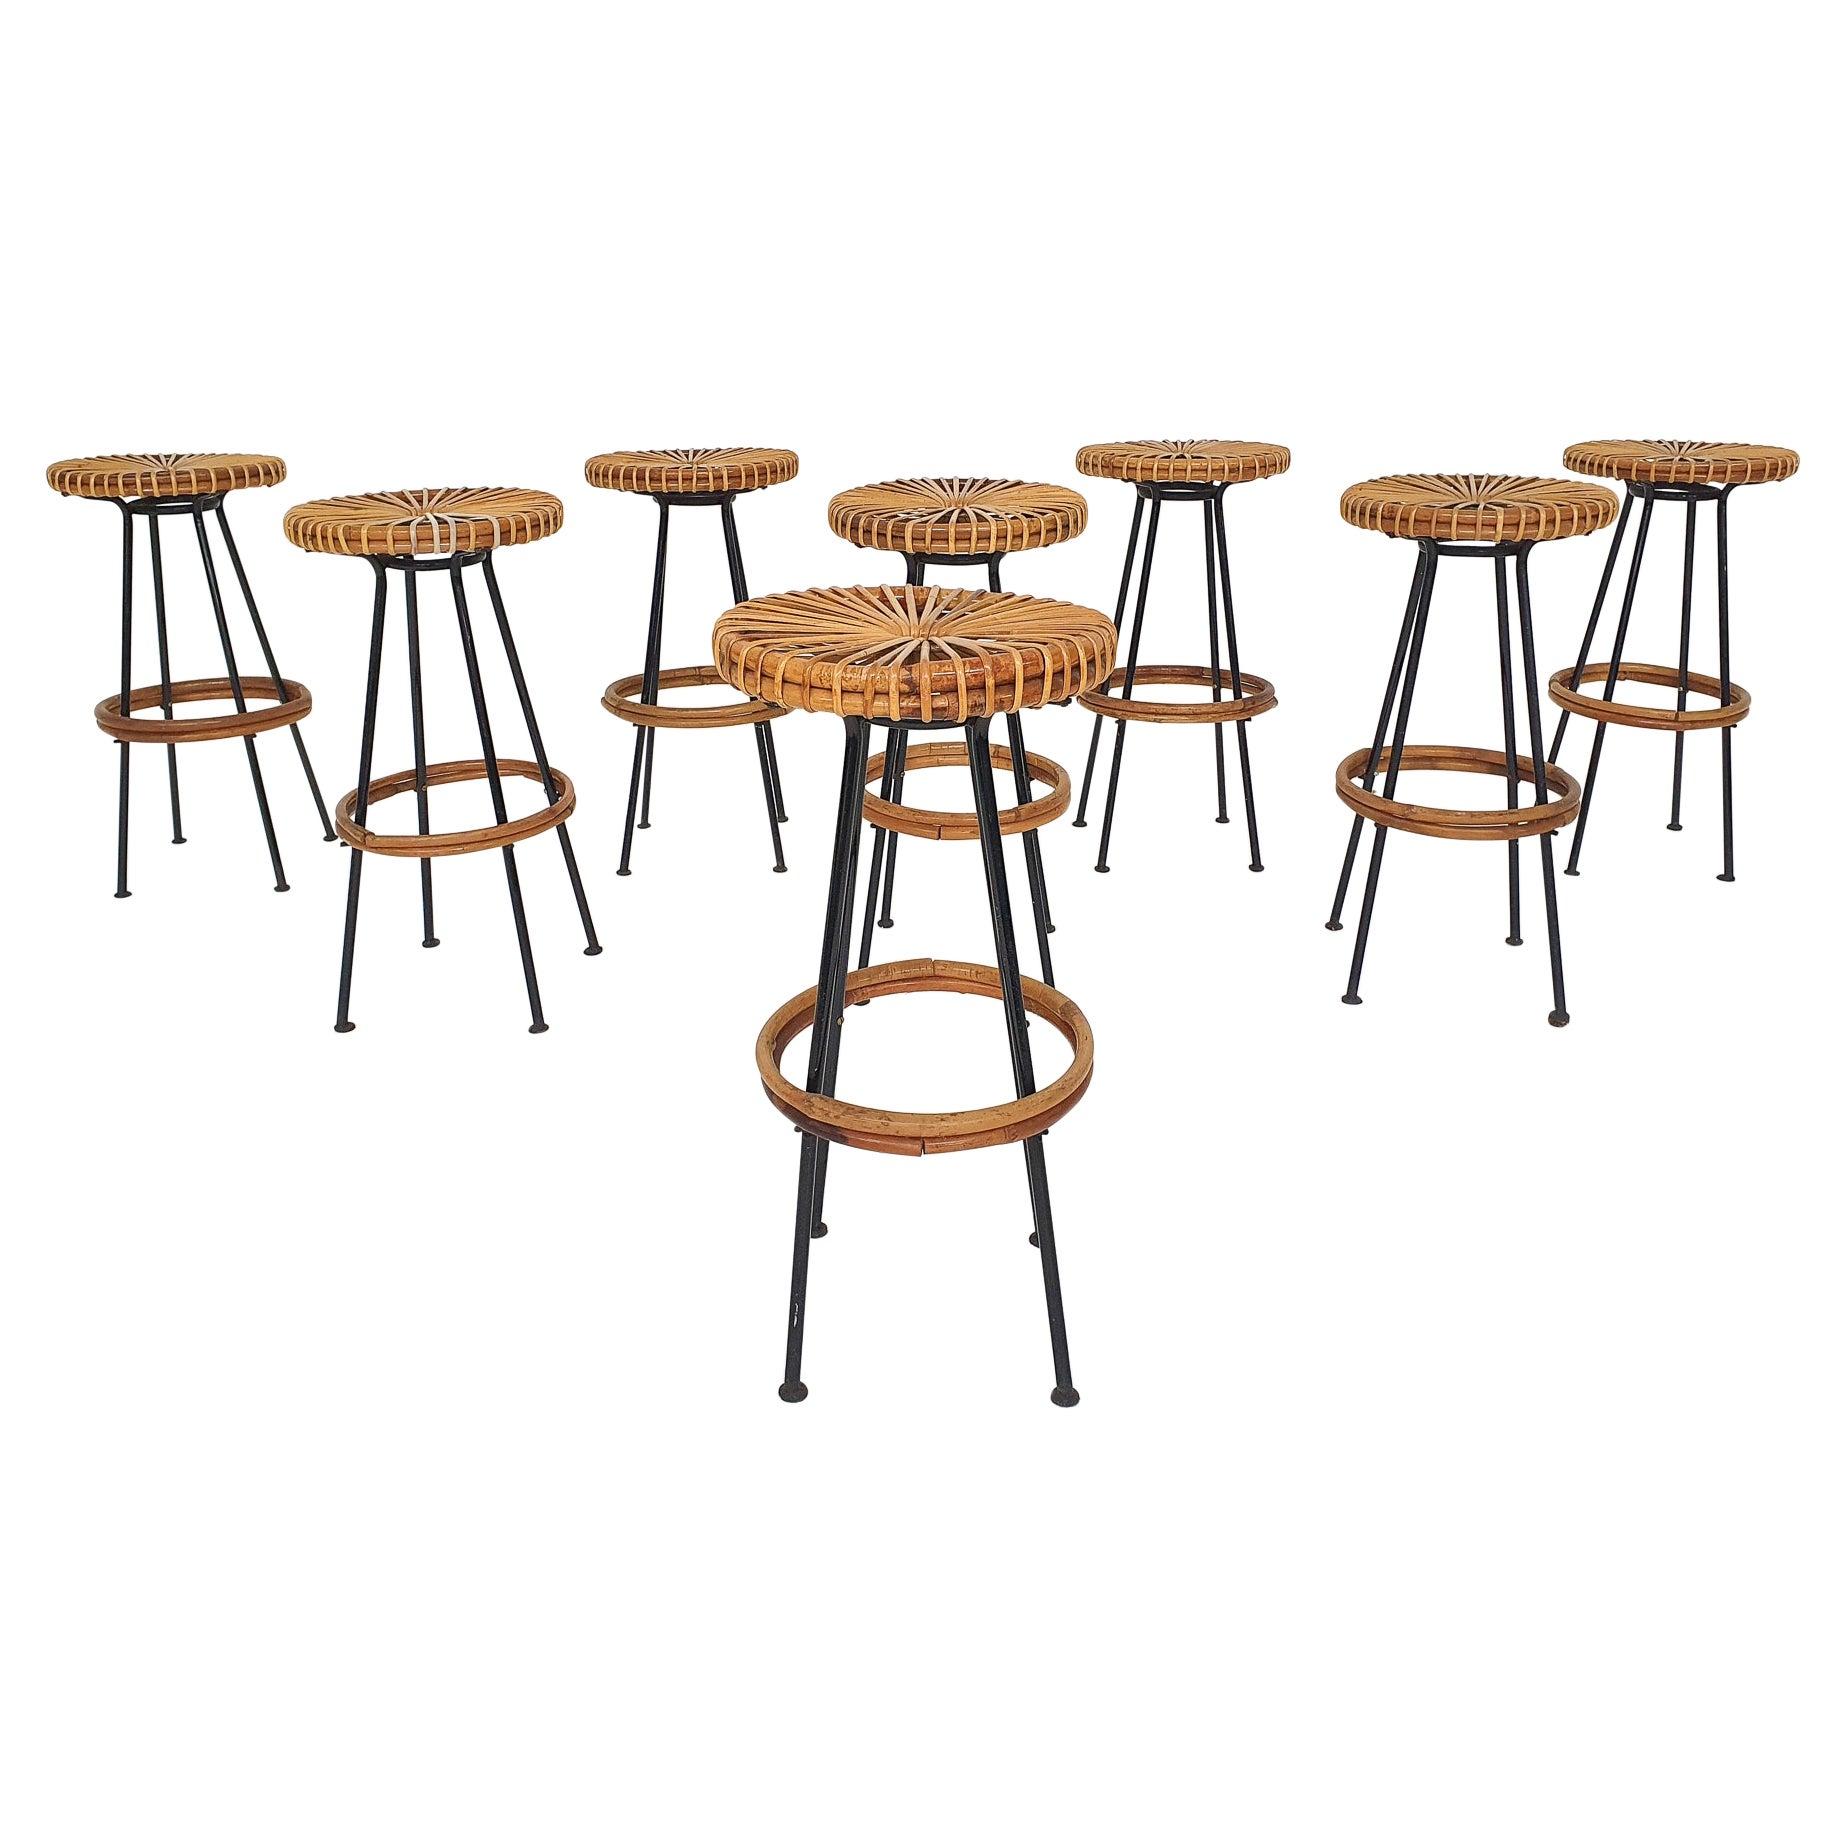 Set of 8 Rohe Noordwolde Rattan Bar Stools, the Netherlands, 1950's